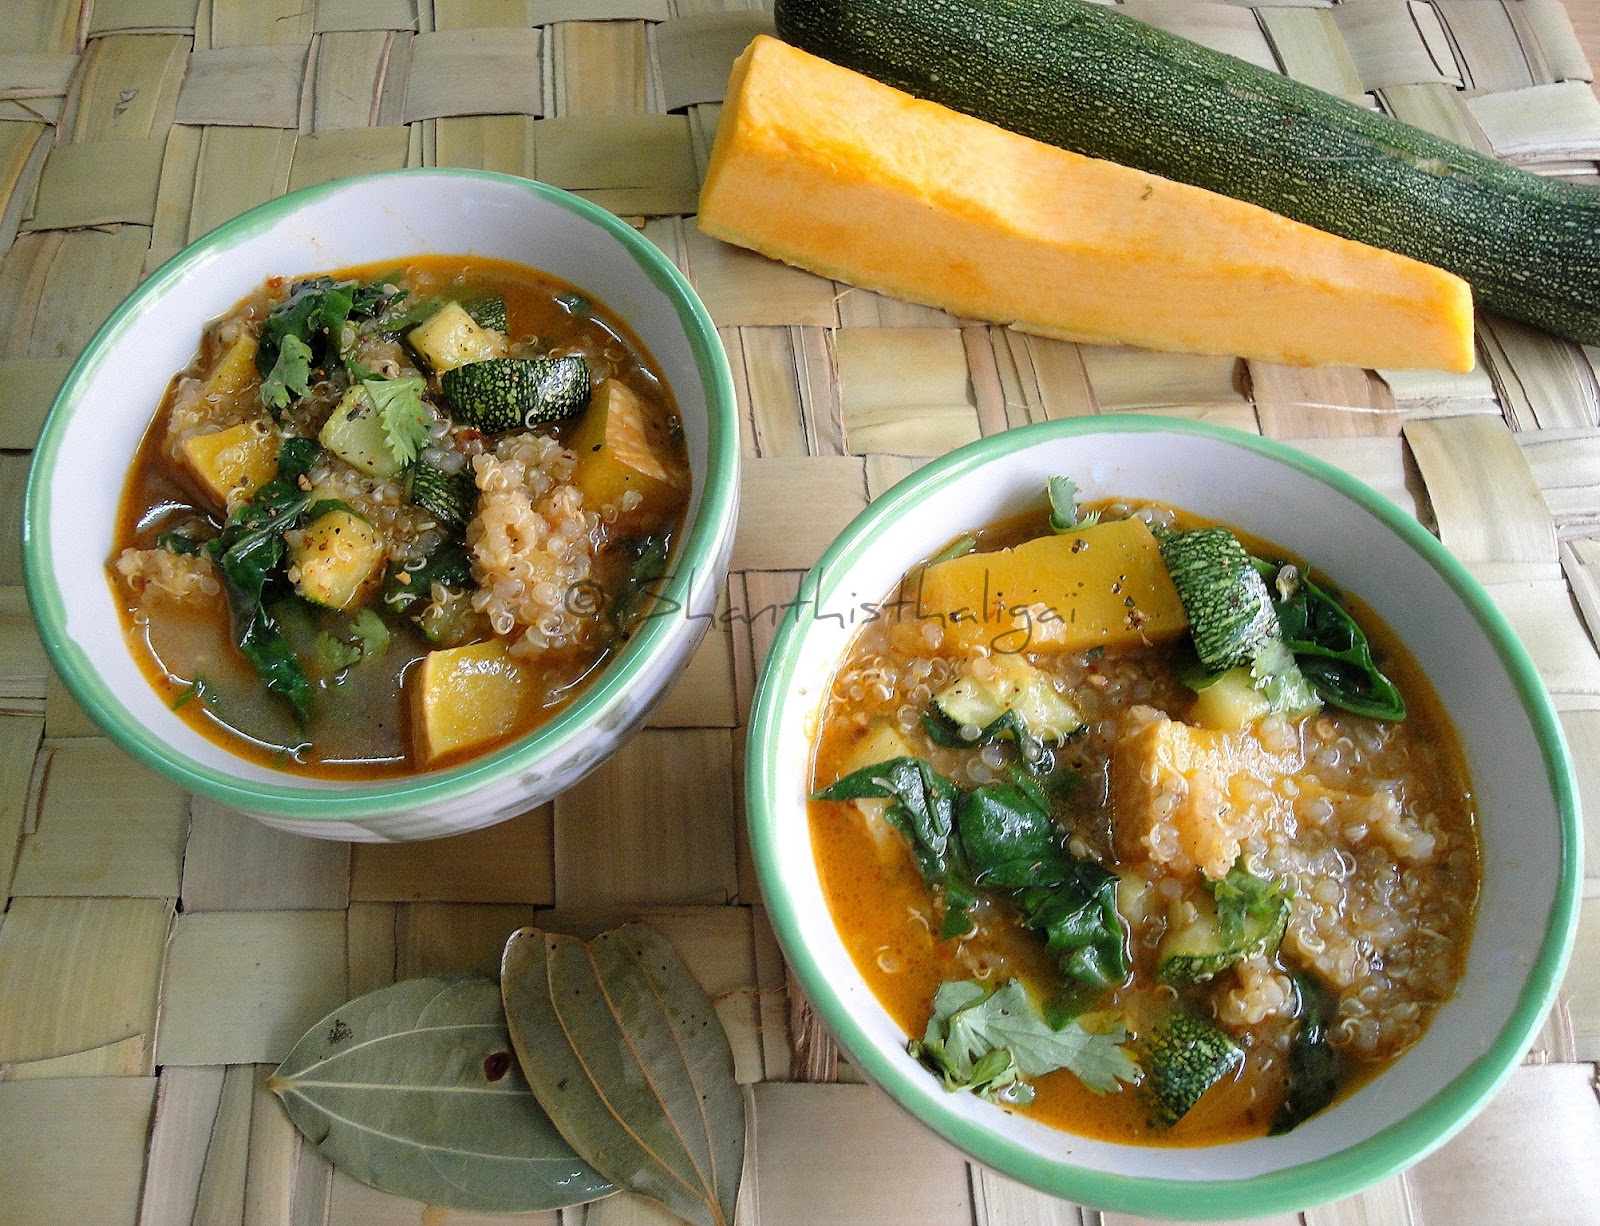 How to make Quinoa veggies soup?